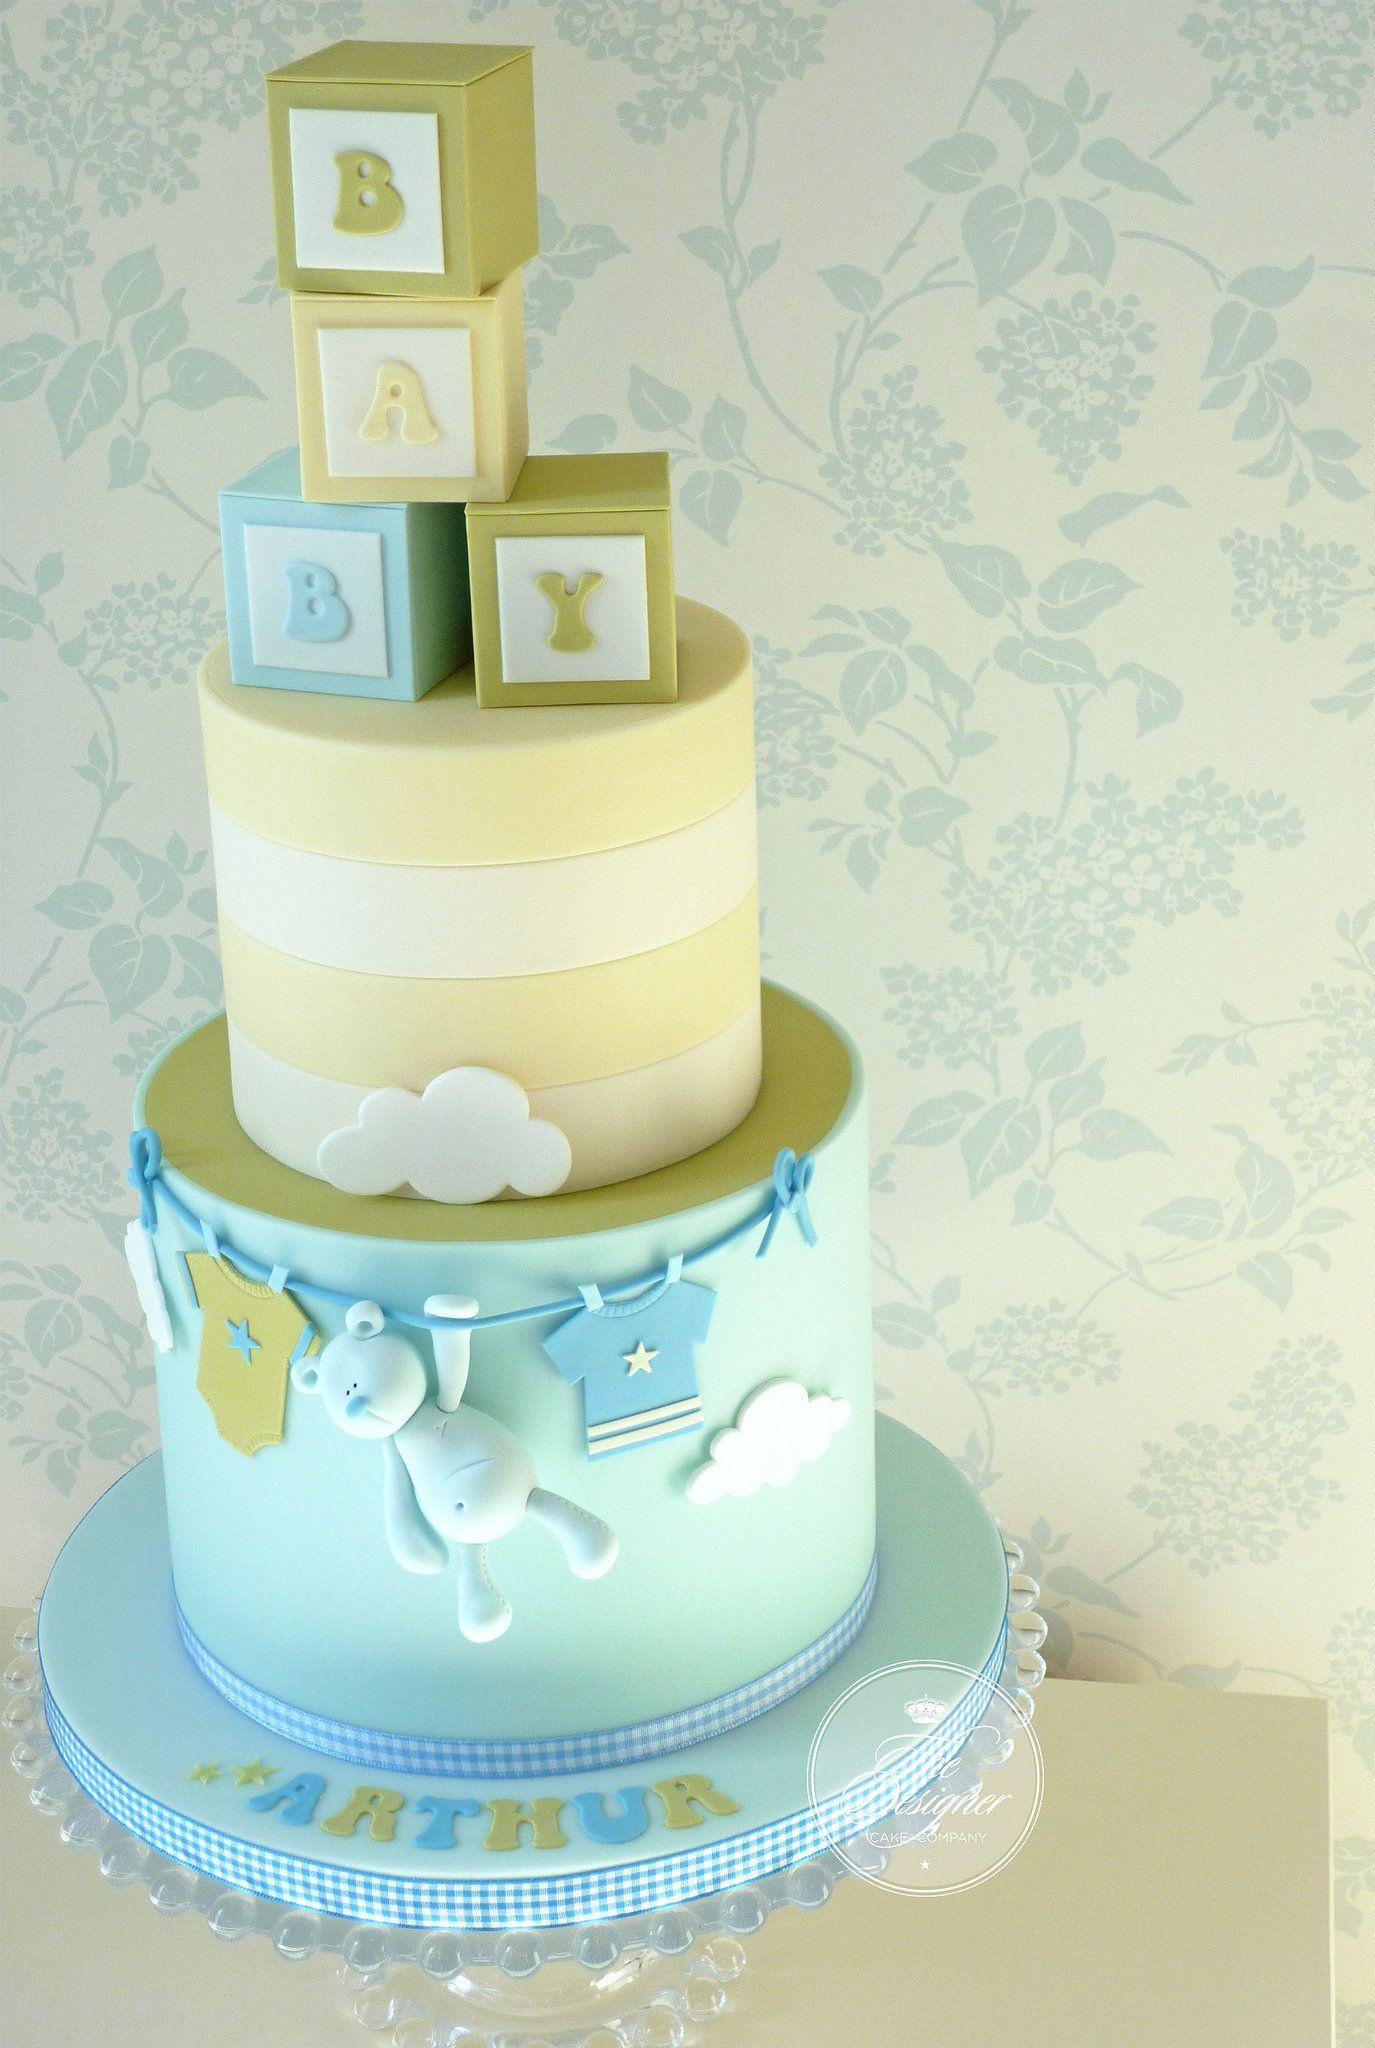 Building blocks baby cake